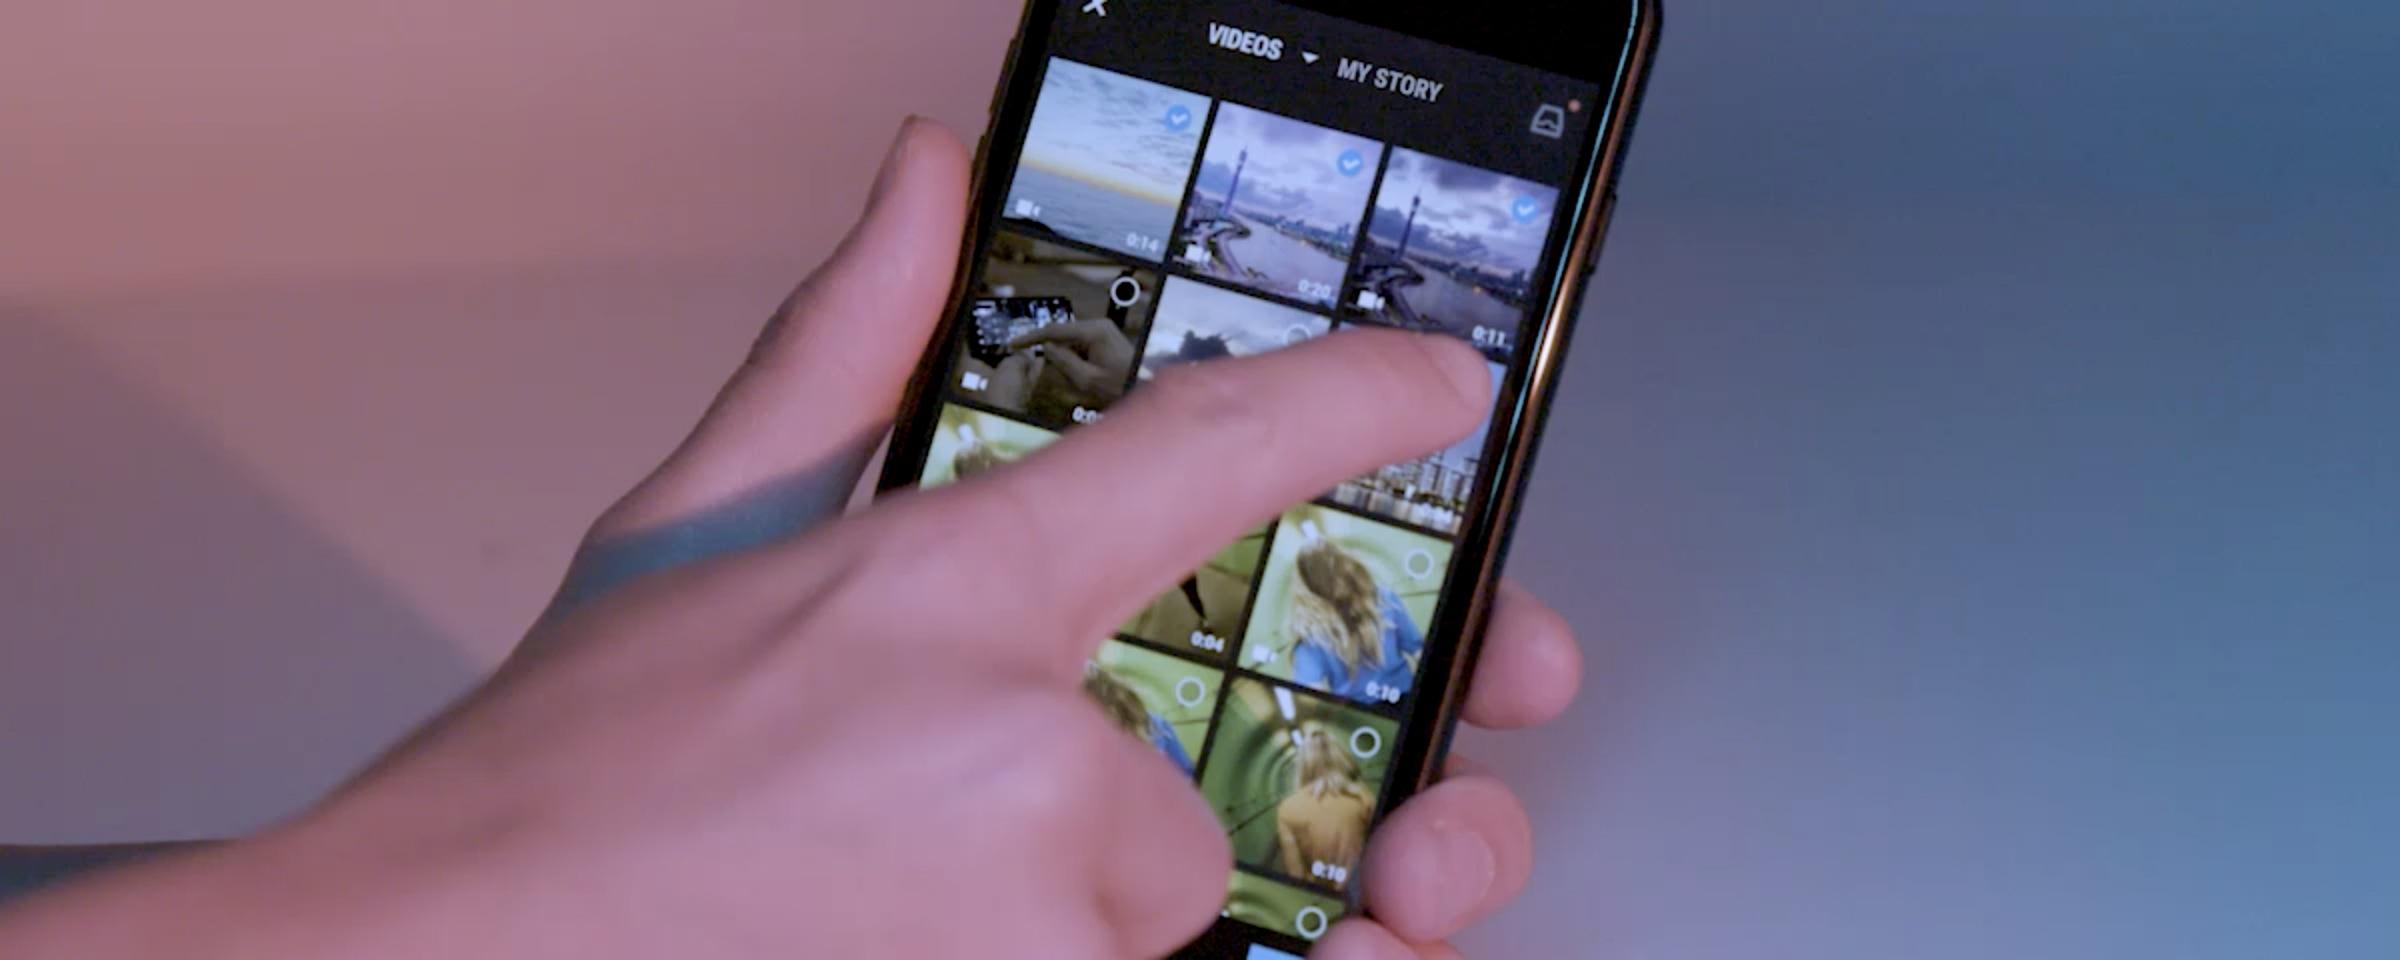 DJI Osmo Pocket – 3-Axis Stabilized Handheld Camera – DJI